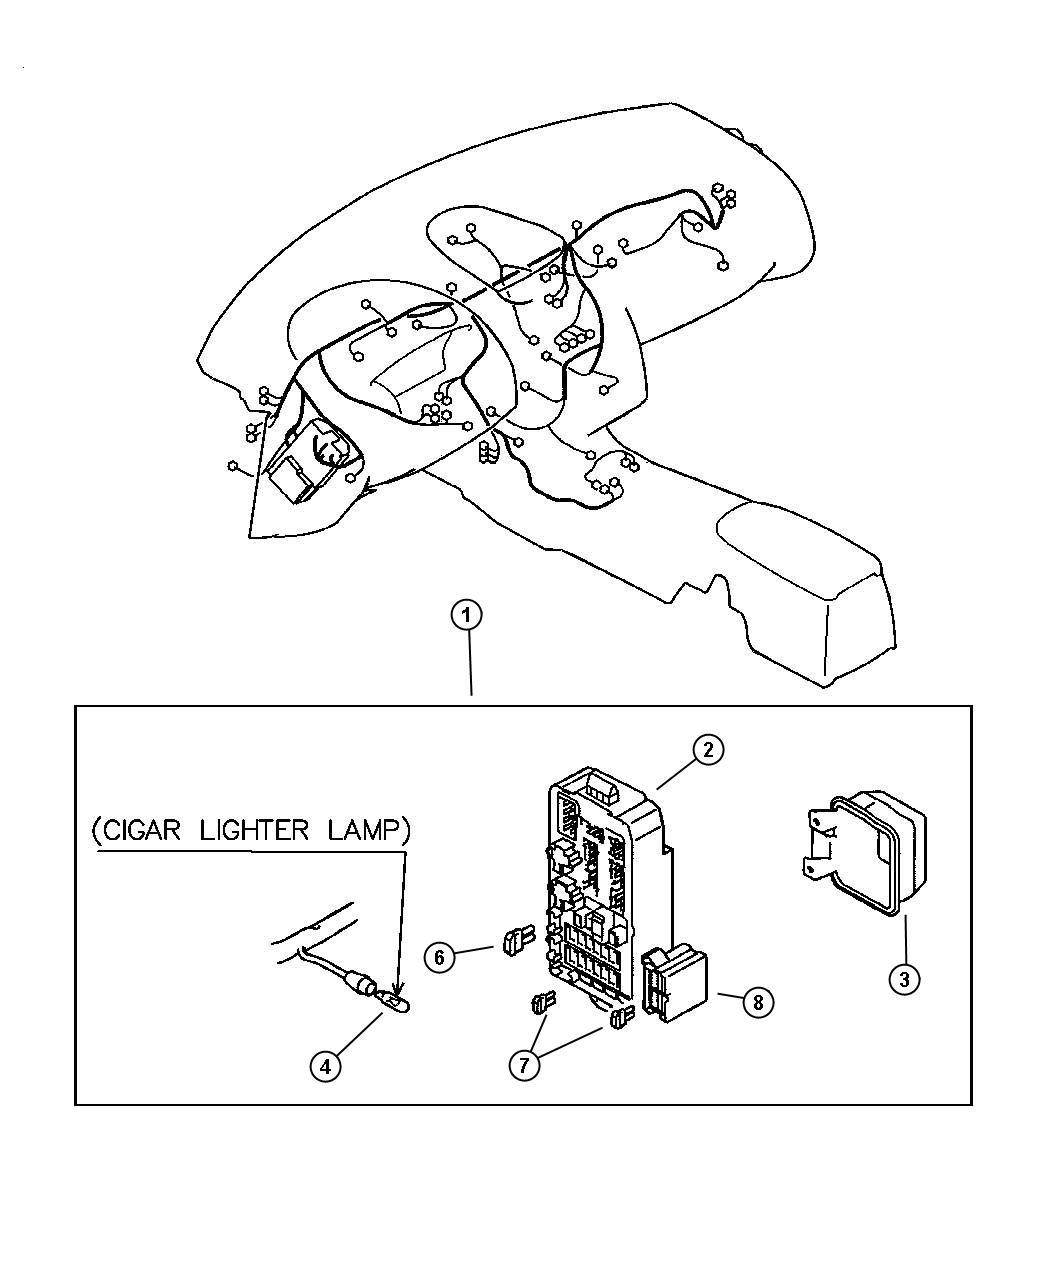 2002 chrysler sebring fuse  mini  20 amp  yellow  wiring  engine  electrical